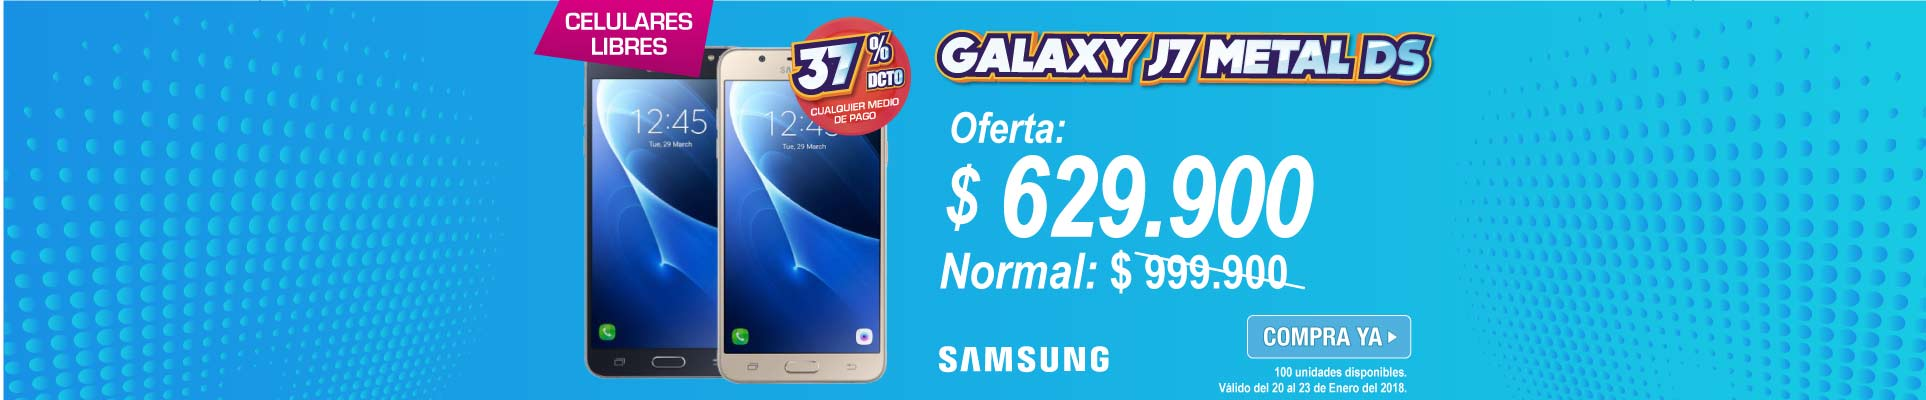 PPAL ALKP-5-celulares-Celular SAMSUNG Galaxy J7  metal-prod-enero20-23